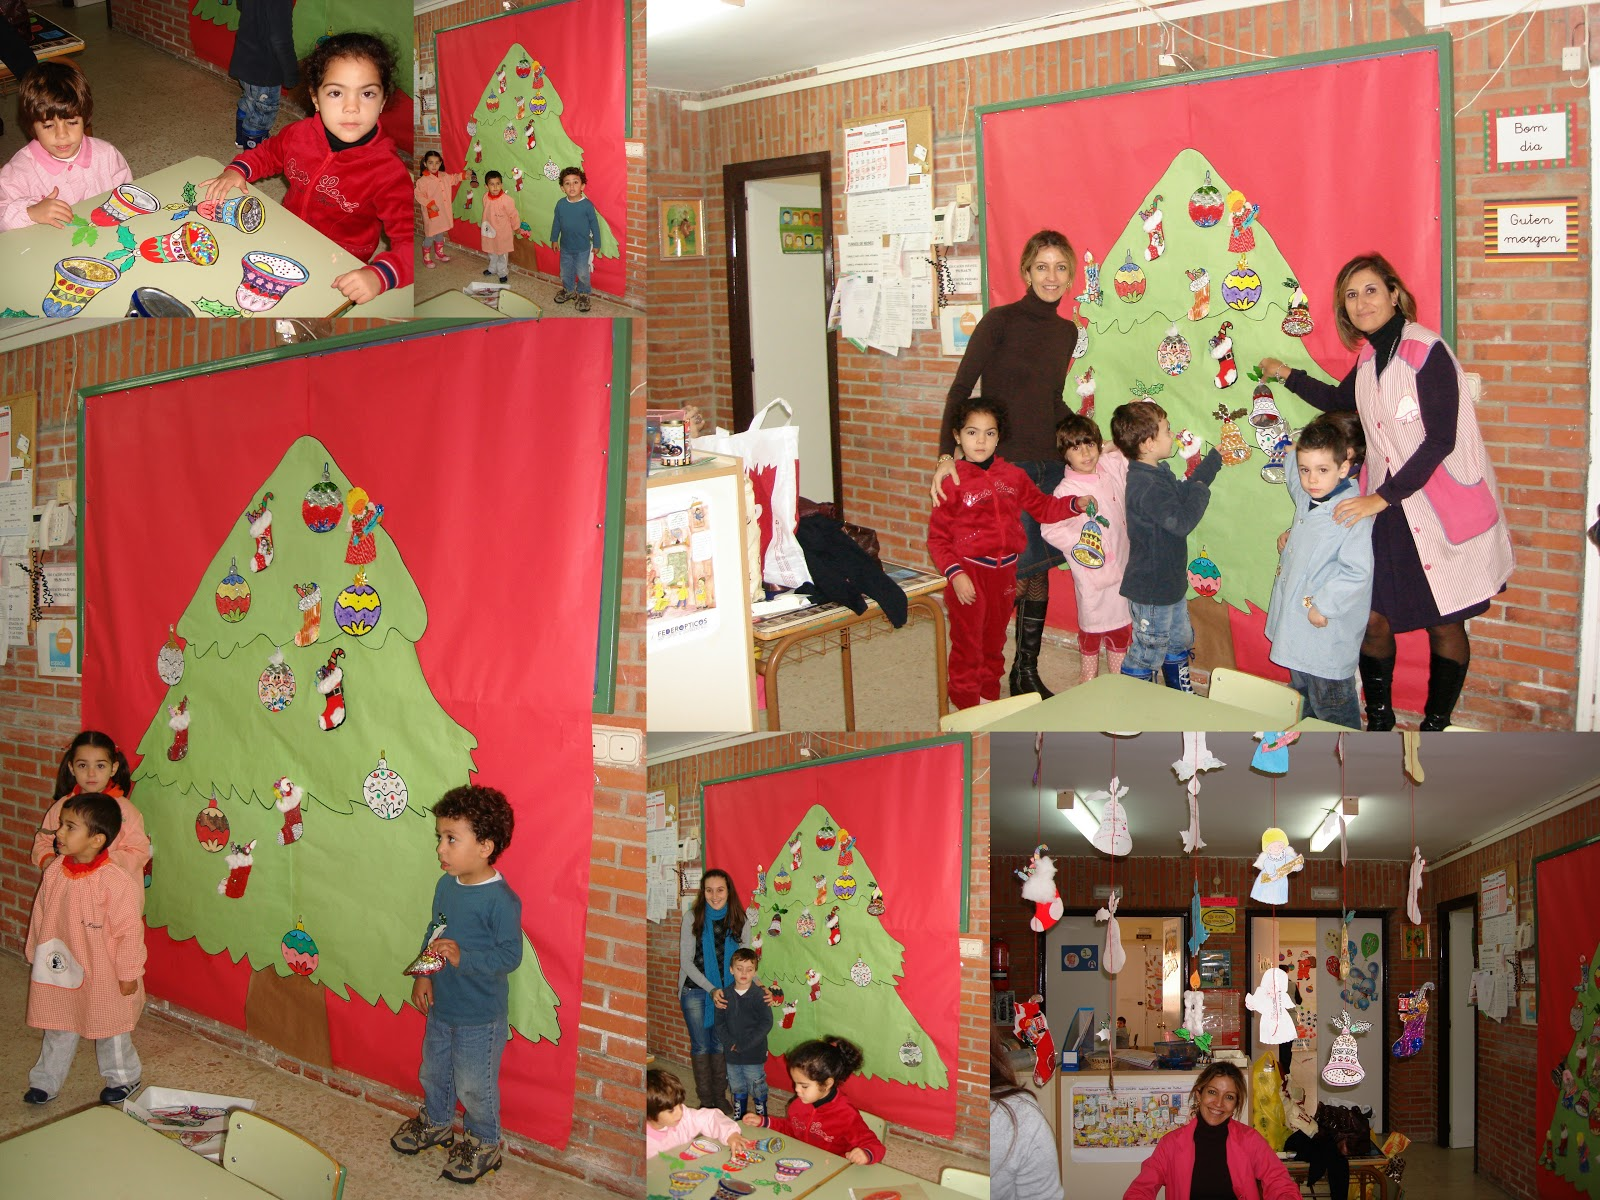 Decoracion Infantil Navidad ~ EL BLOG DEL MOREJ?N Decoraci?n navide?a en Infantil